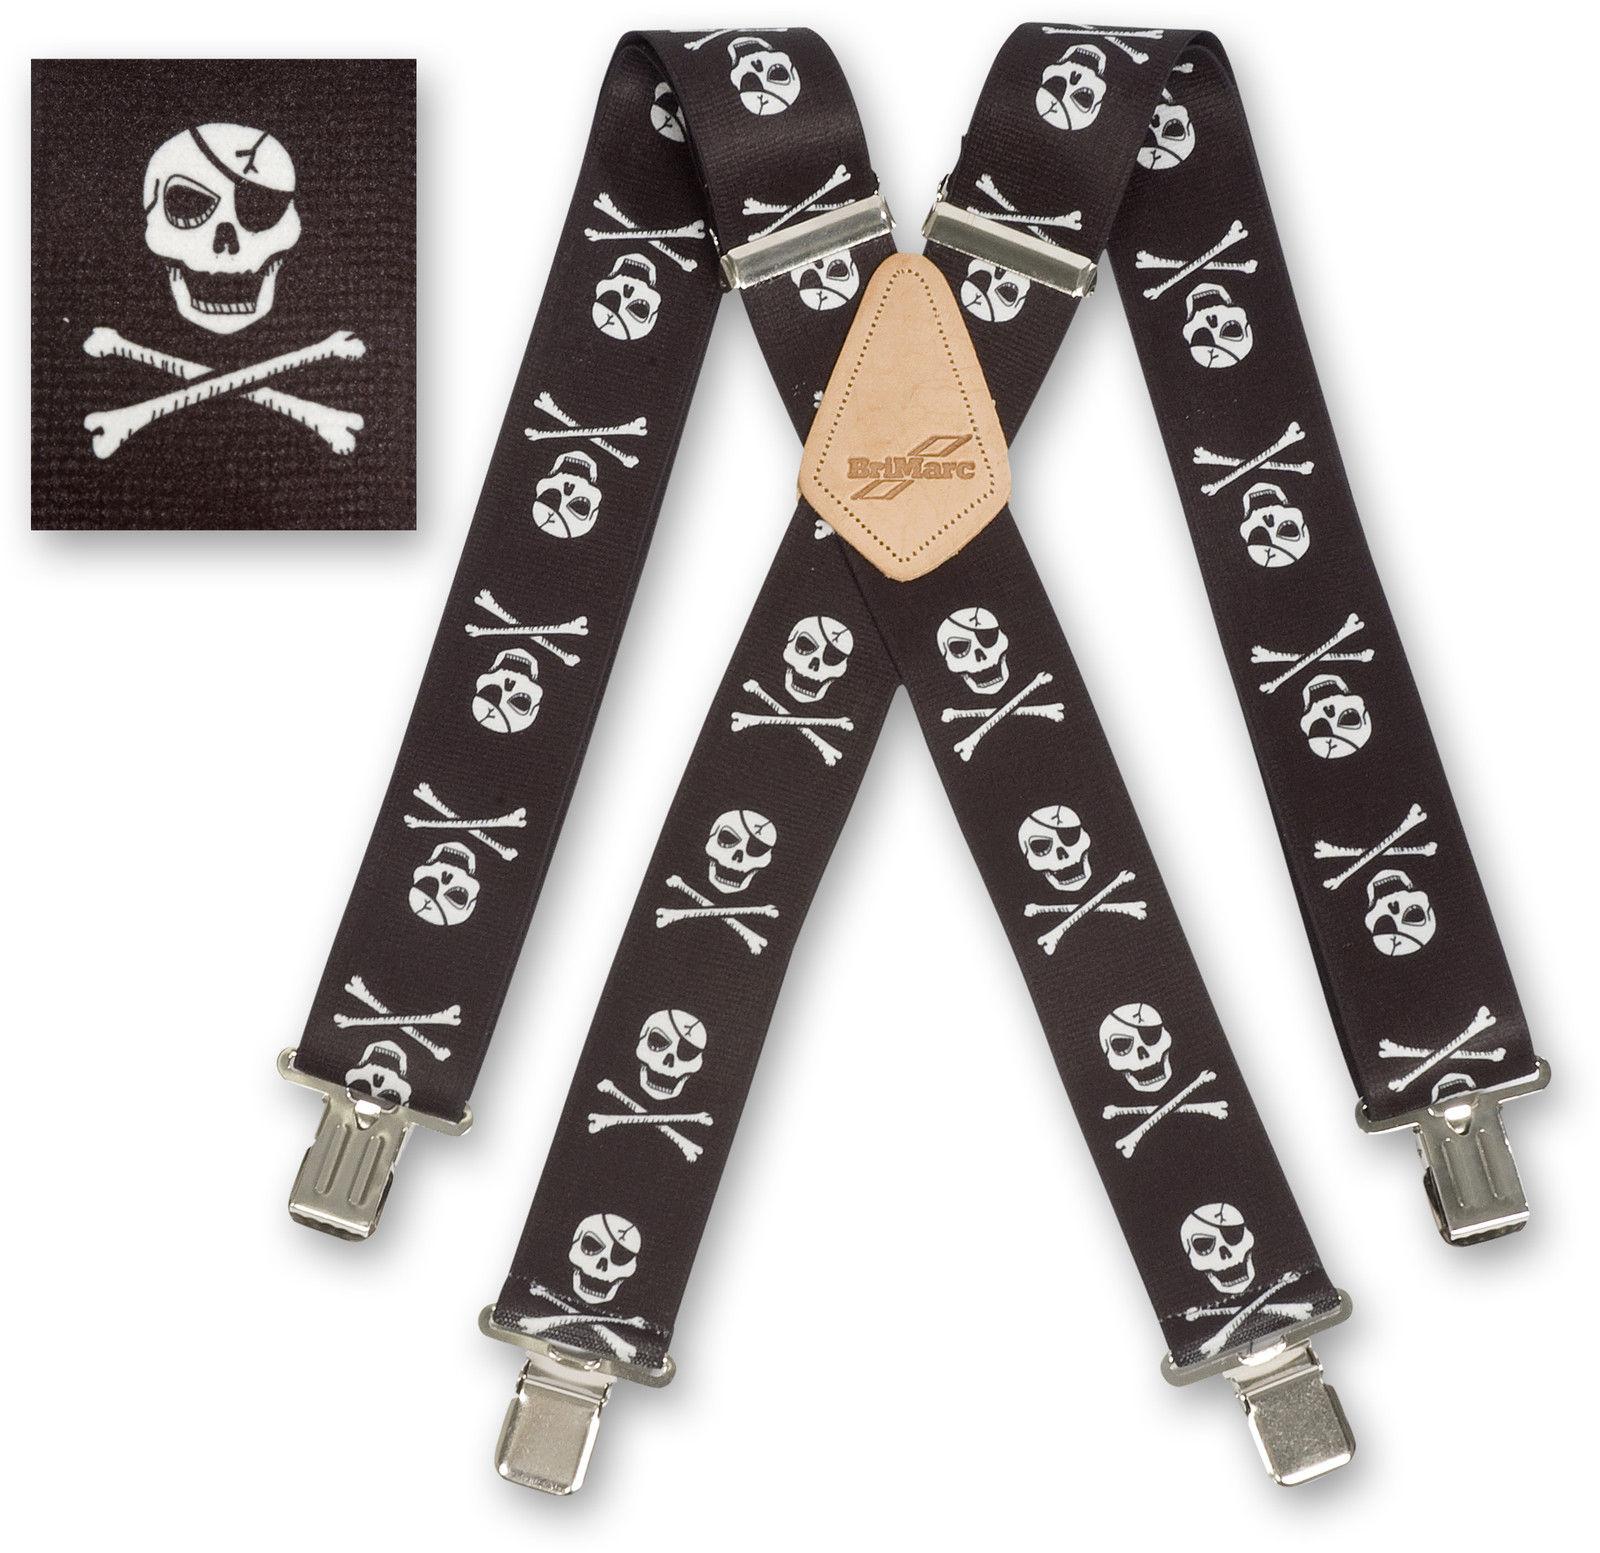 "Brimarc Mens Braces Heavy Duty Suspenders 2/"" 50mm Wide Scotland Braces"